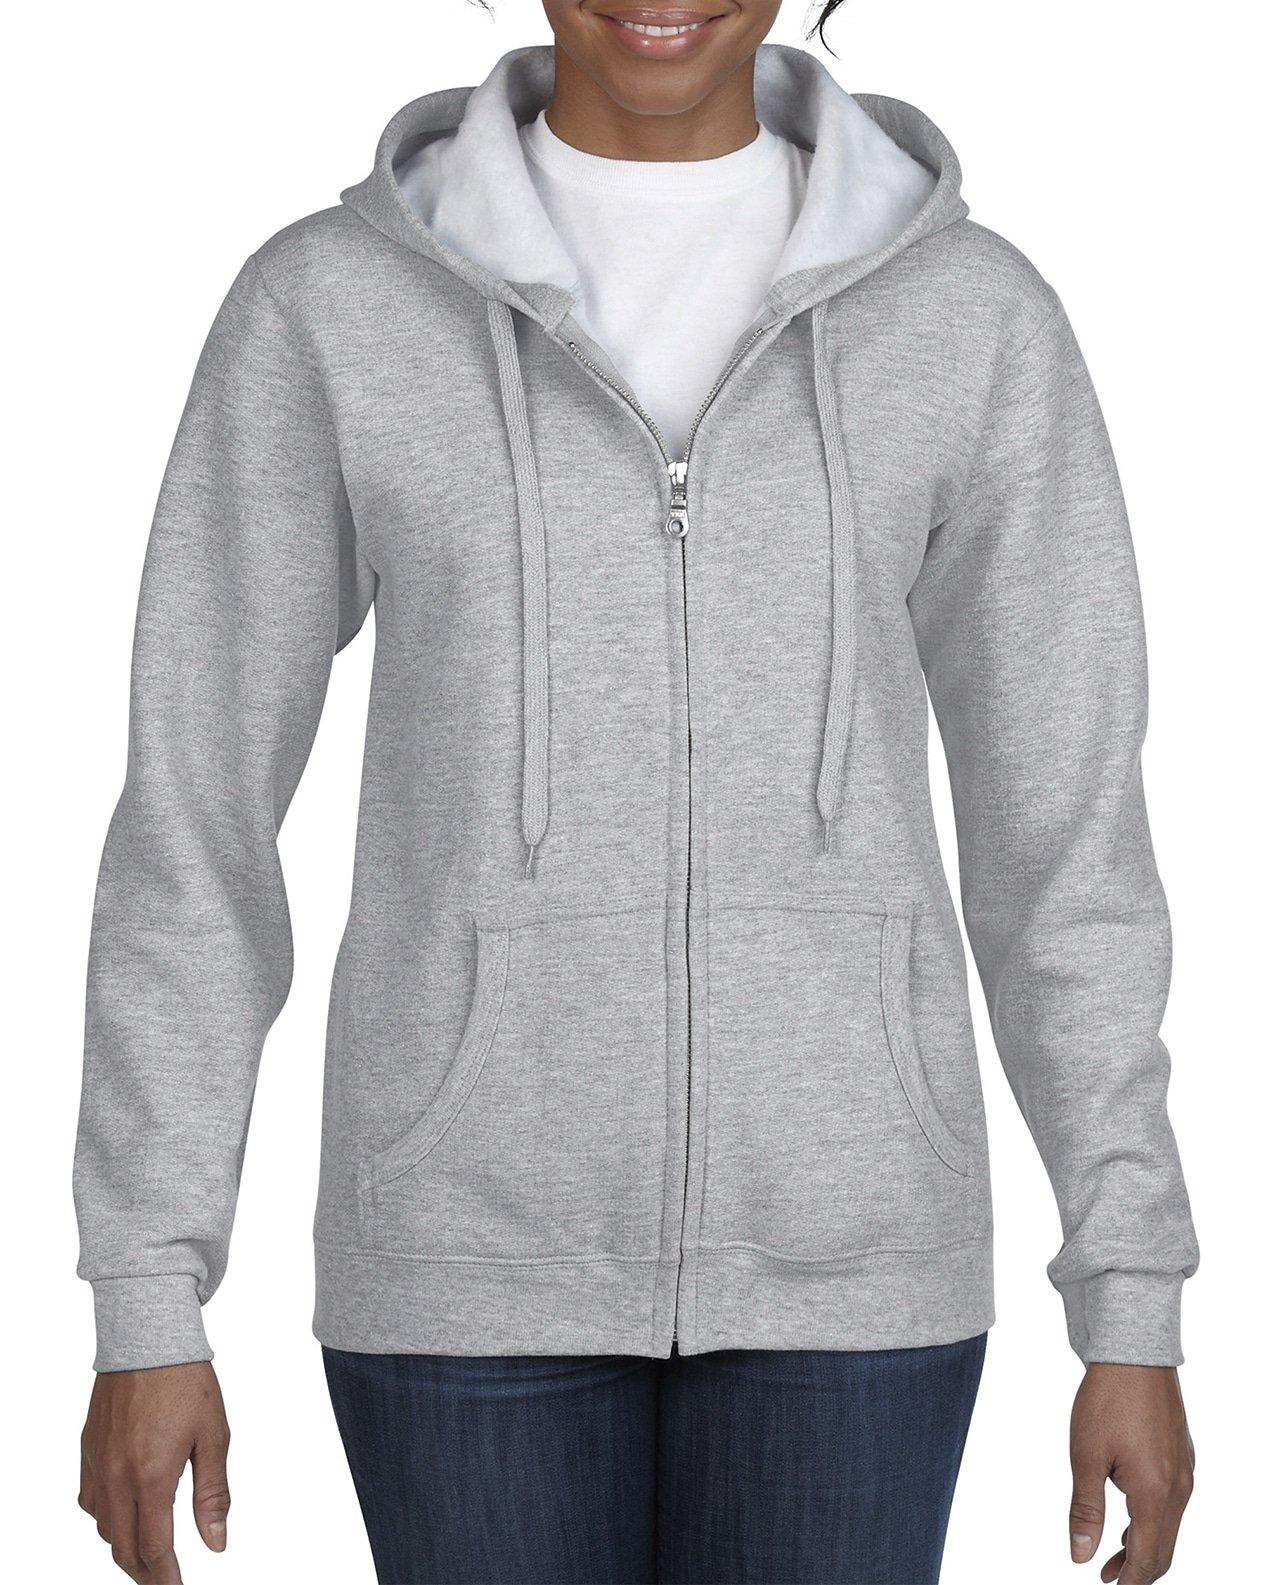 Gildan Women's Full Zip Hooded Sweatshirt, Sport Grey, Medium by Gildan